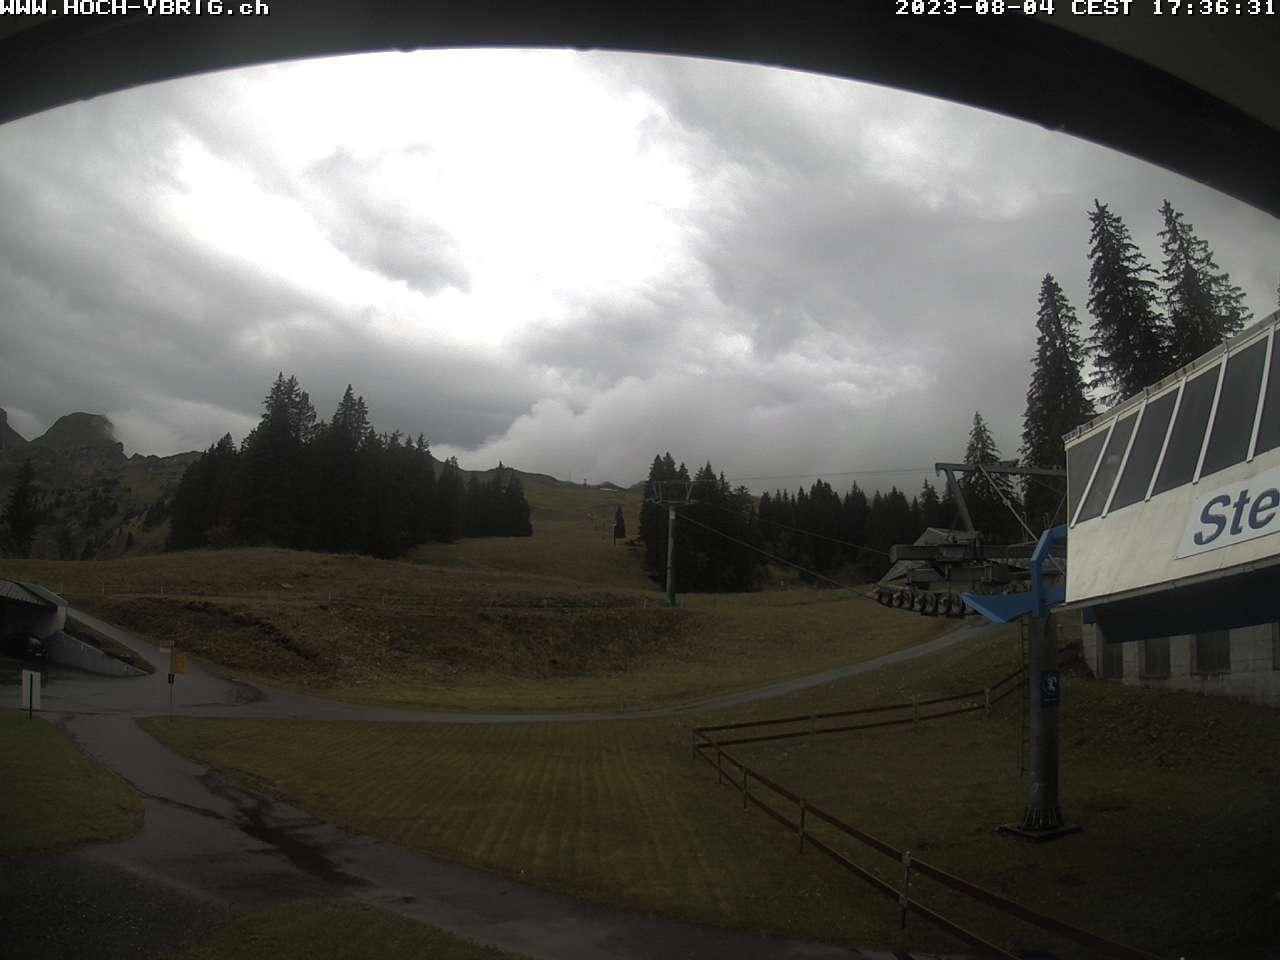 Webcam Hoch-Ybrig Sternen